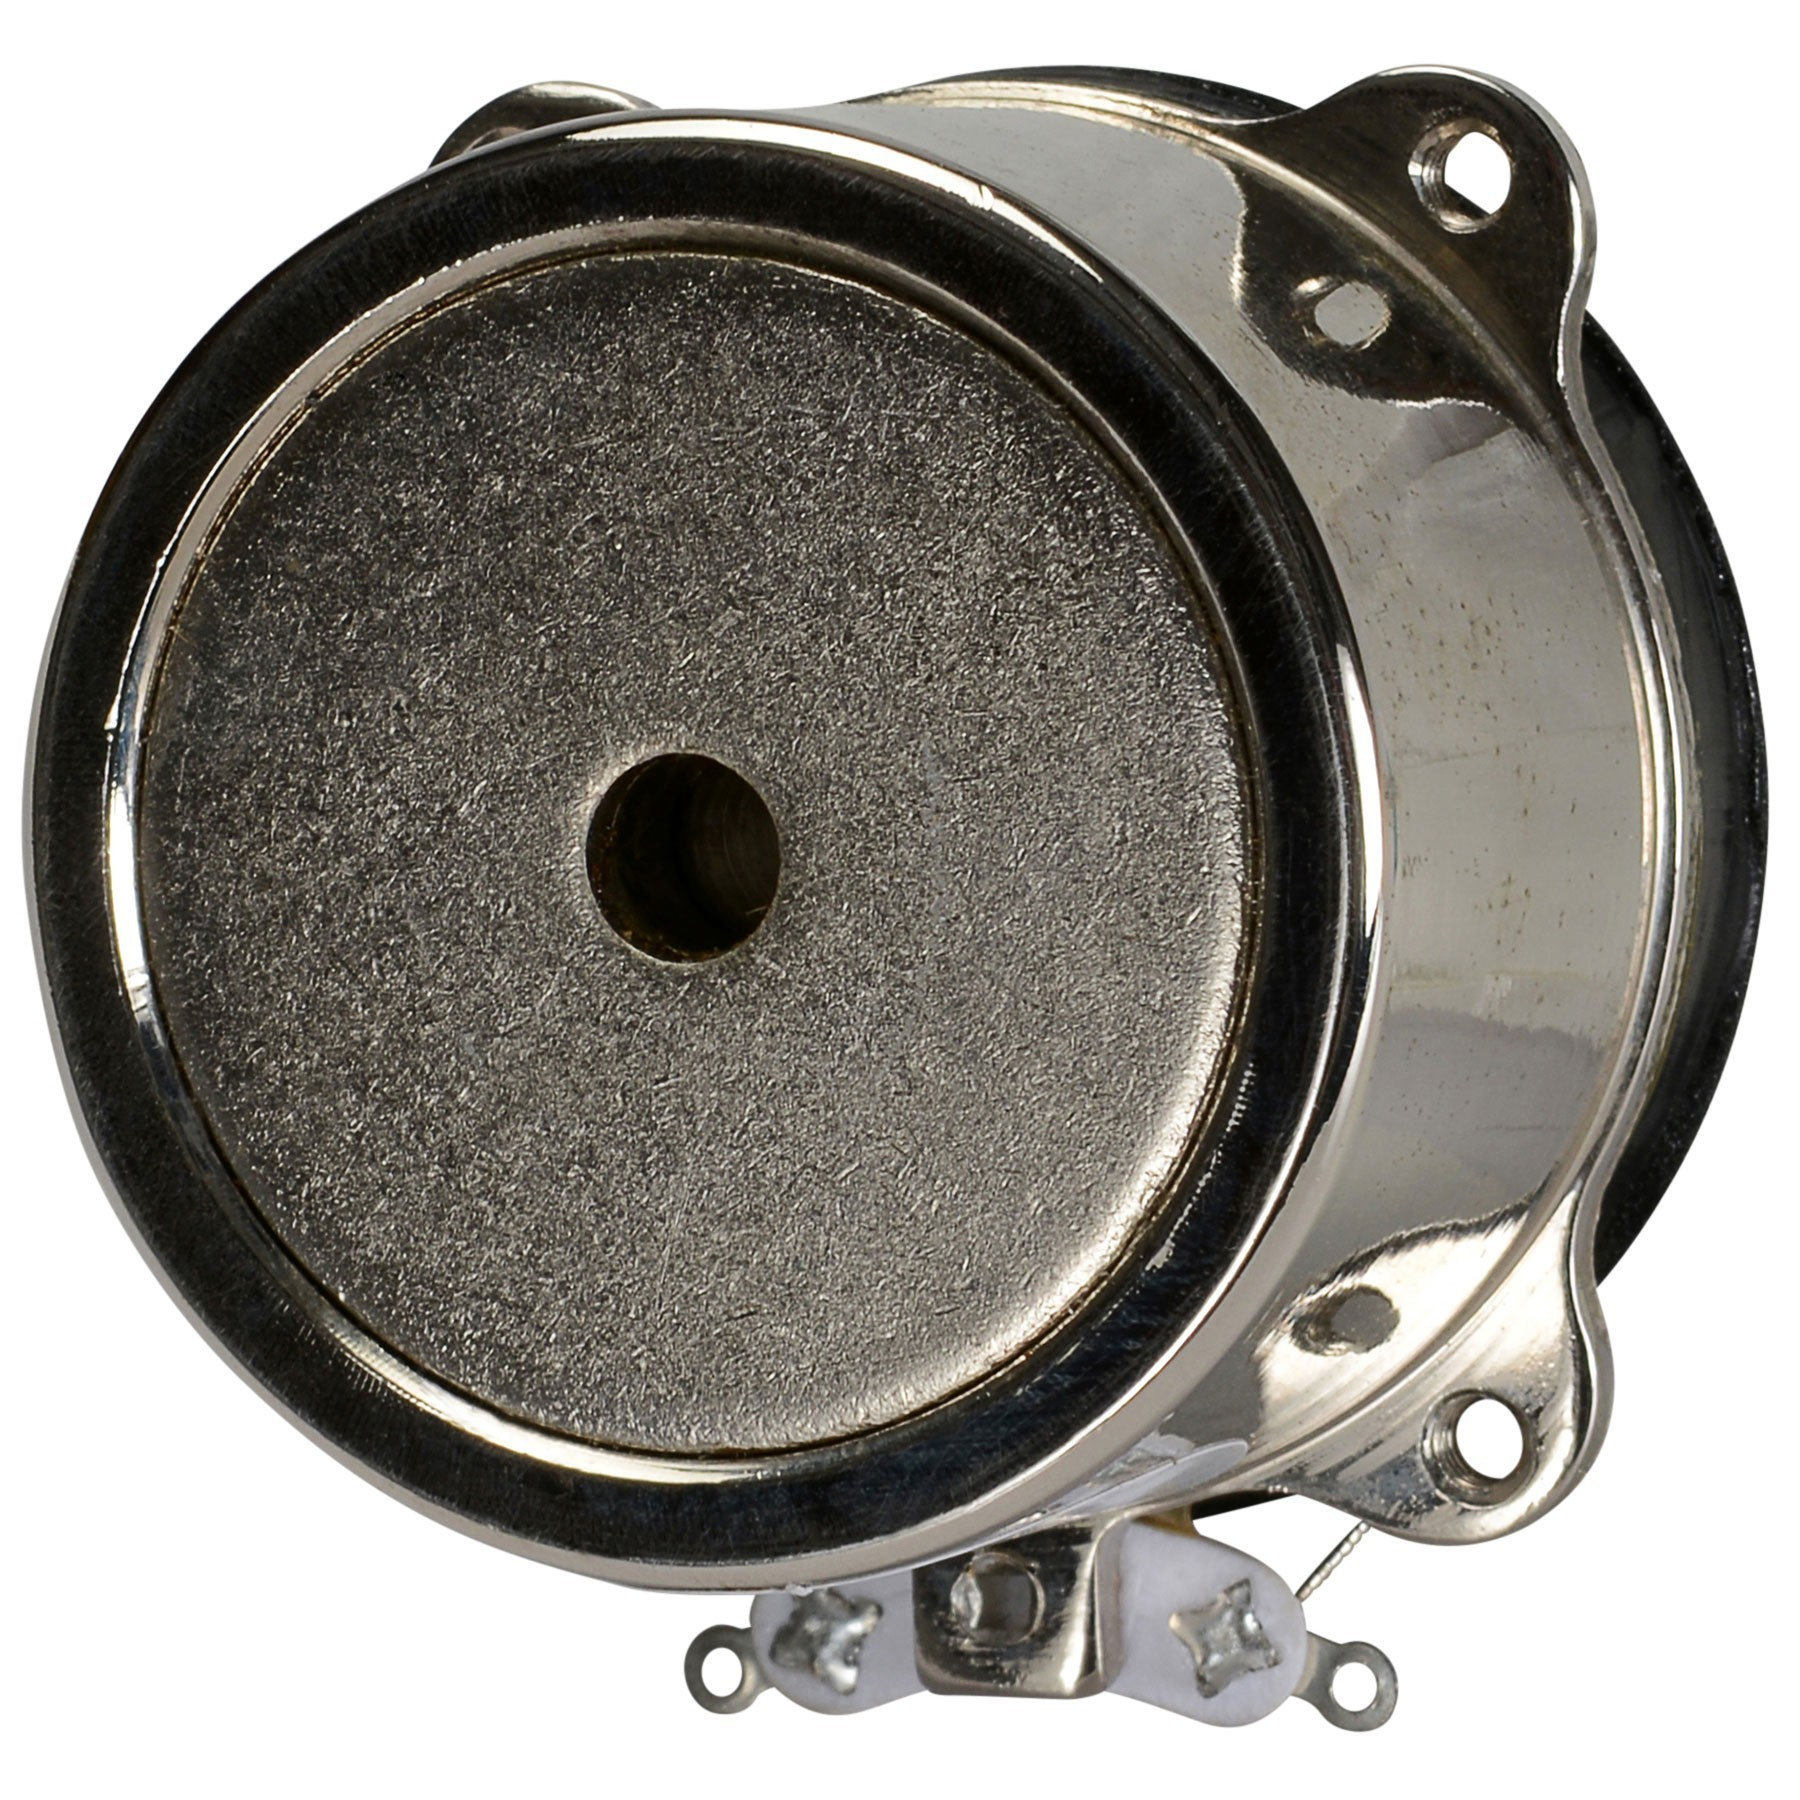 DAYTON AUDIO DAEX25SHF-4 Speaker Driver Exciter Bodyshaker 20W 4 Ohm Ø2.5cm